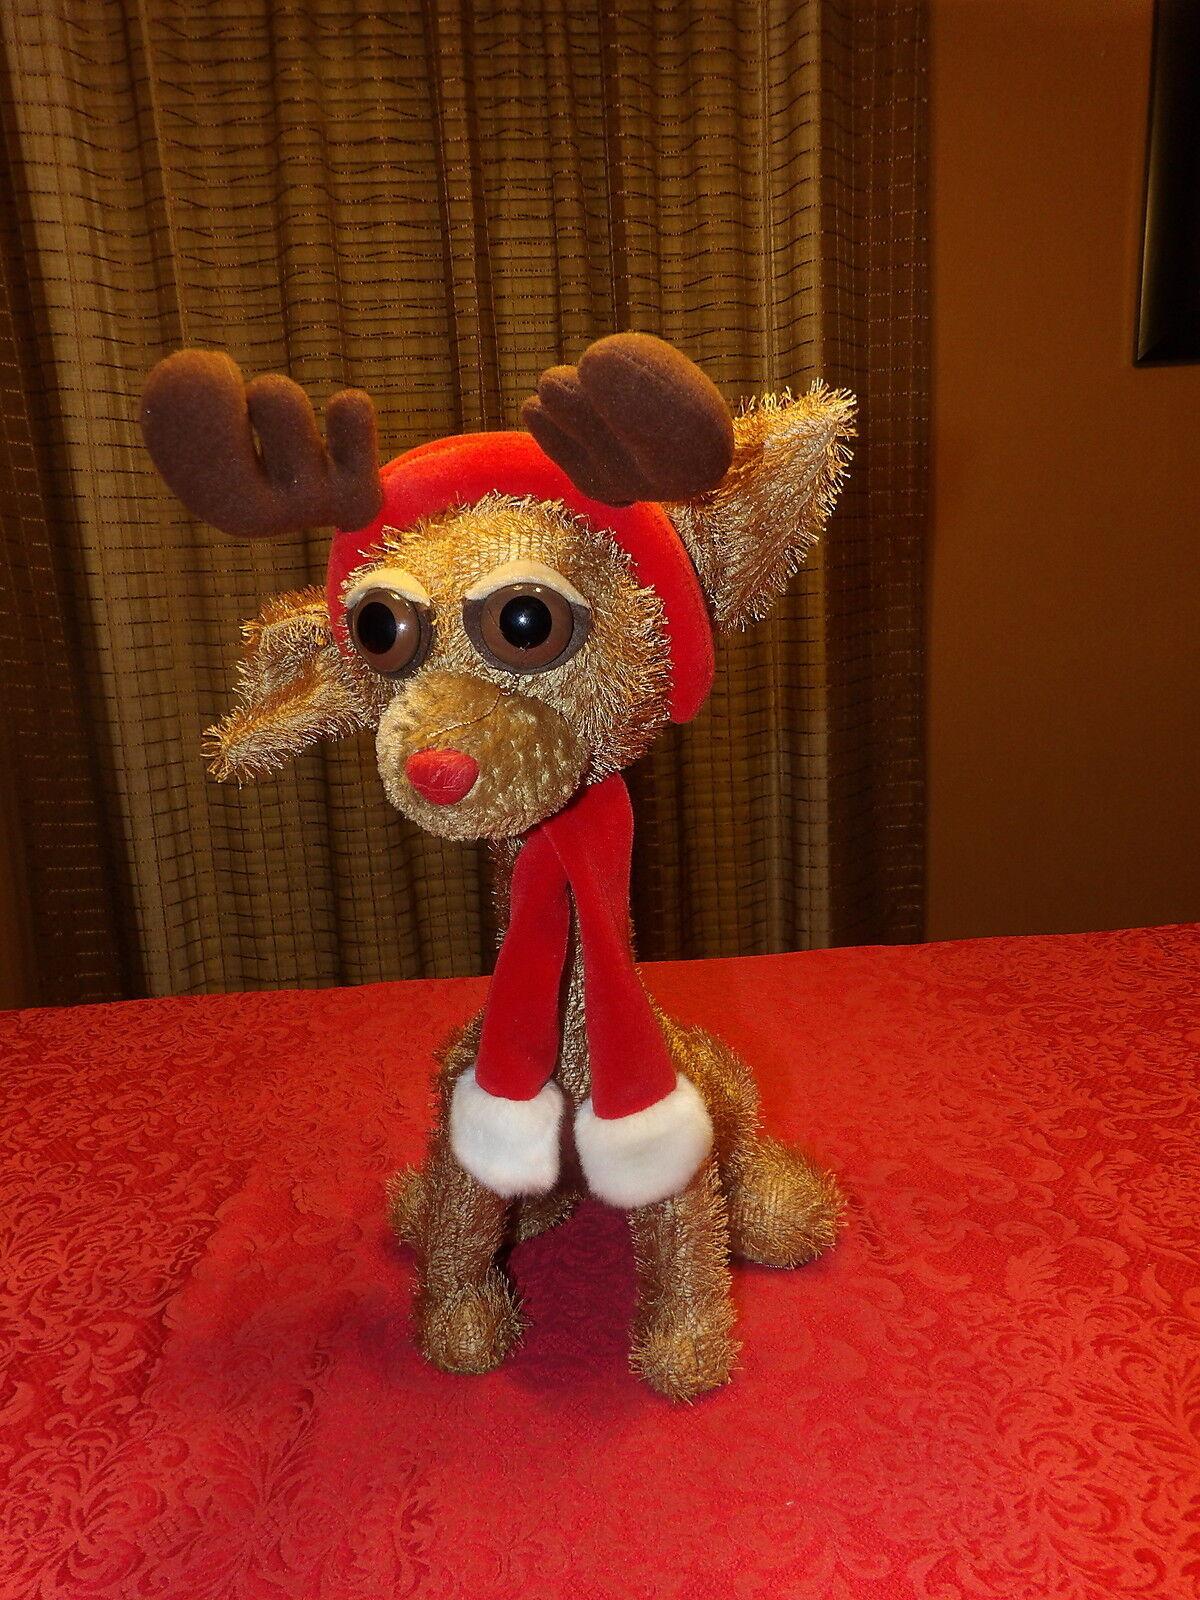 Htf 18 Twisted Whiskers Reindeer Dog W Antlers Scarf American